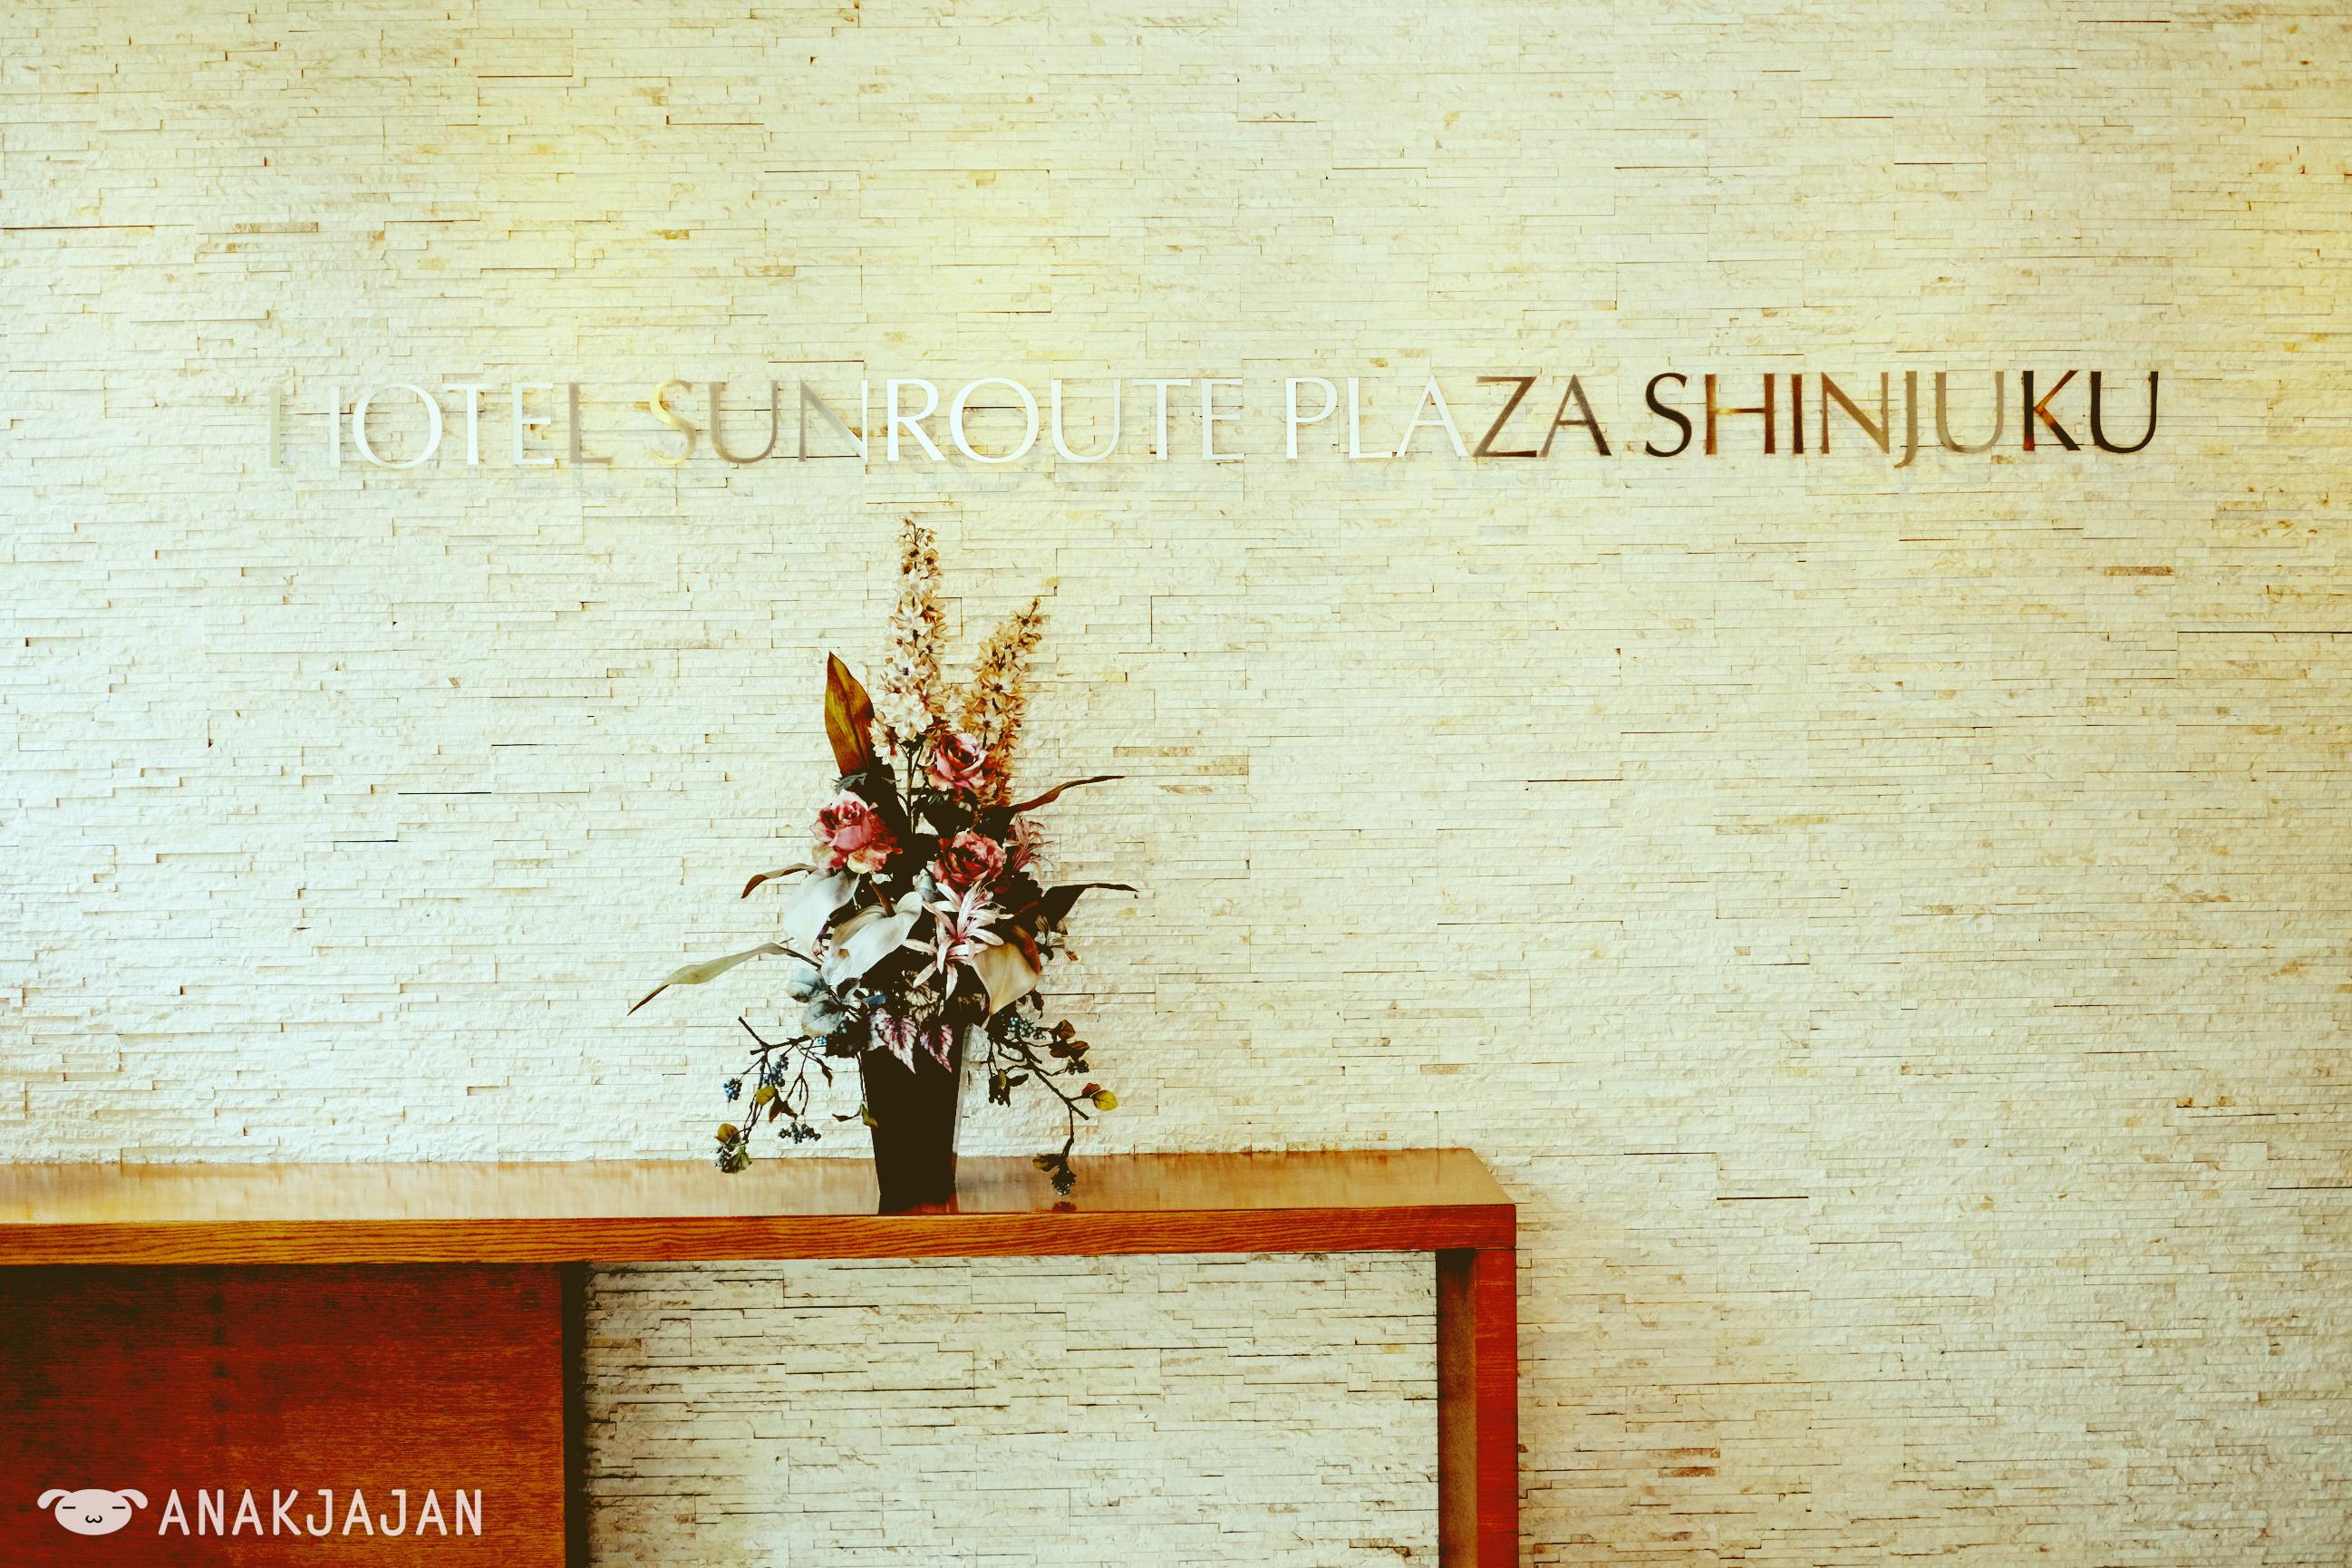 Hotel Sunroute Shinjuku Rooms